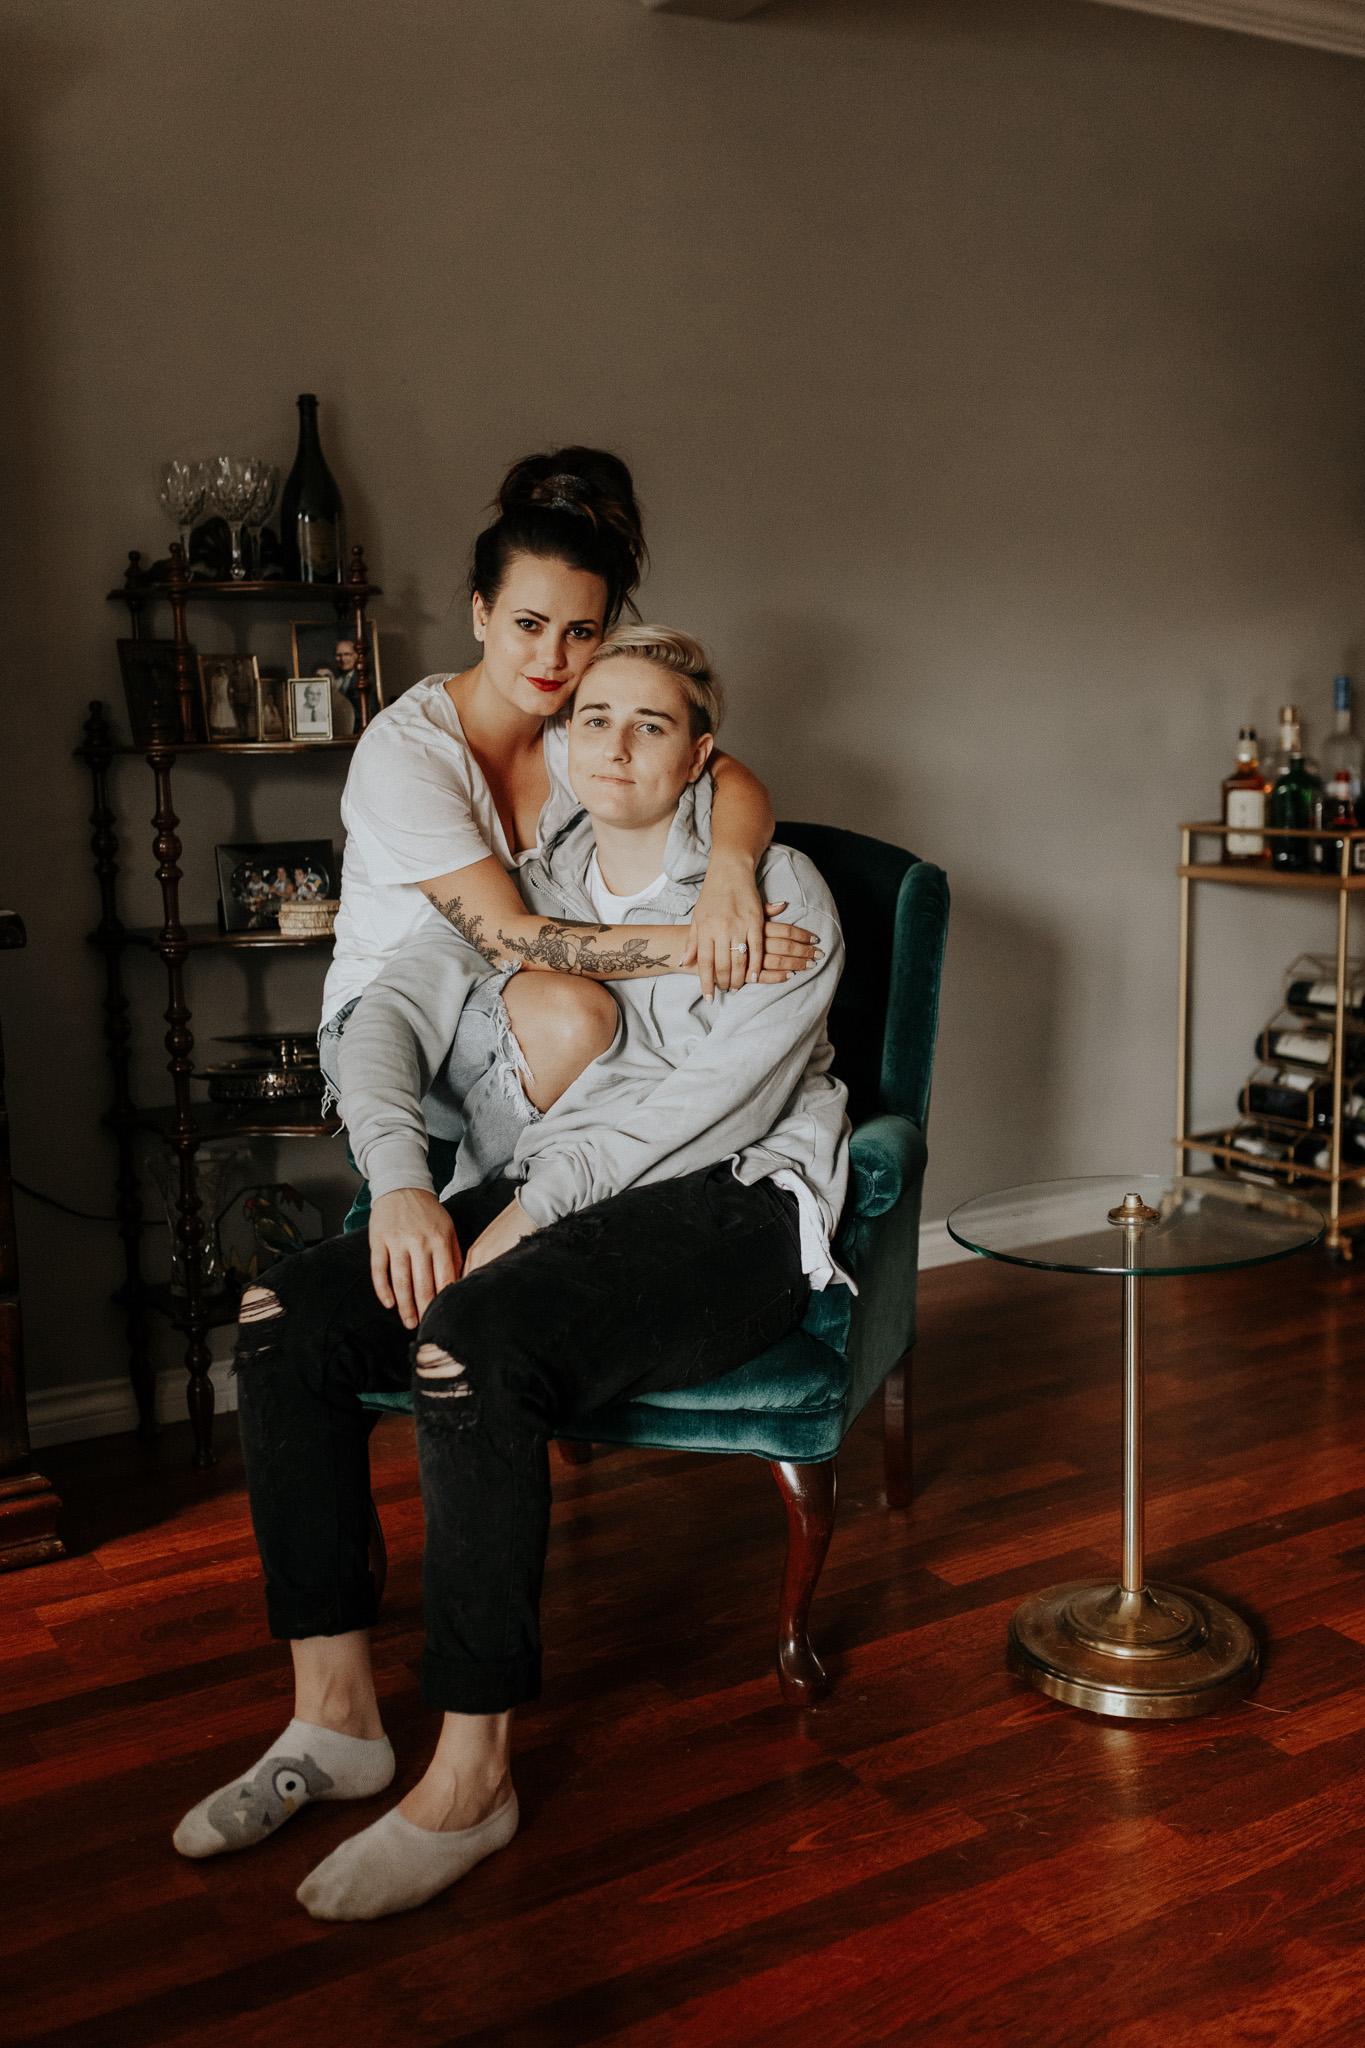 vancouver wedding photographer - lifestyle engagement session-35.jpg